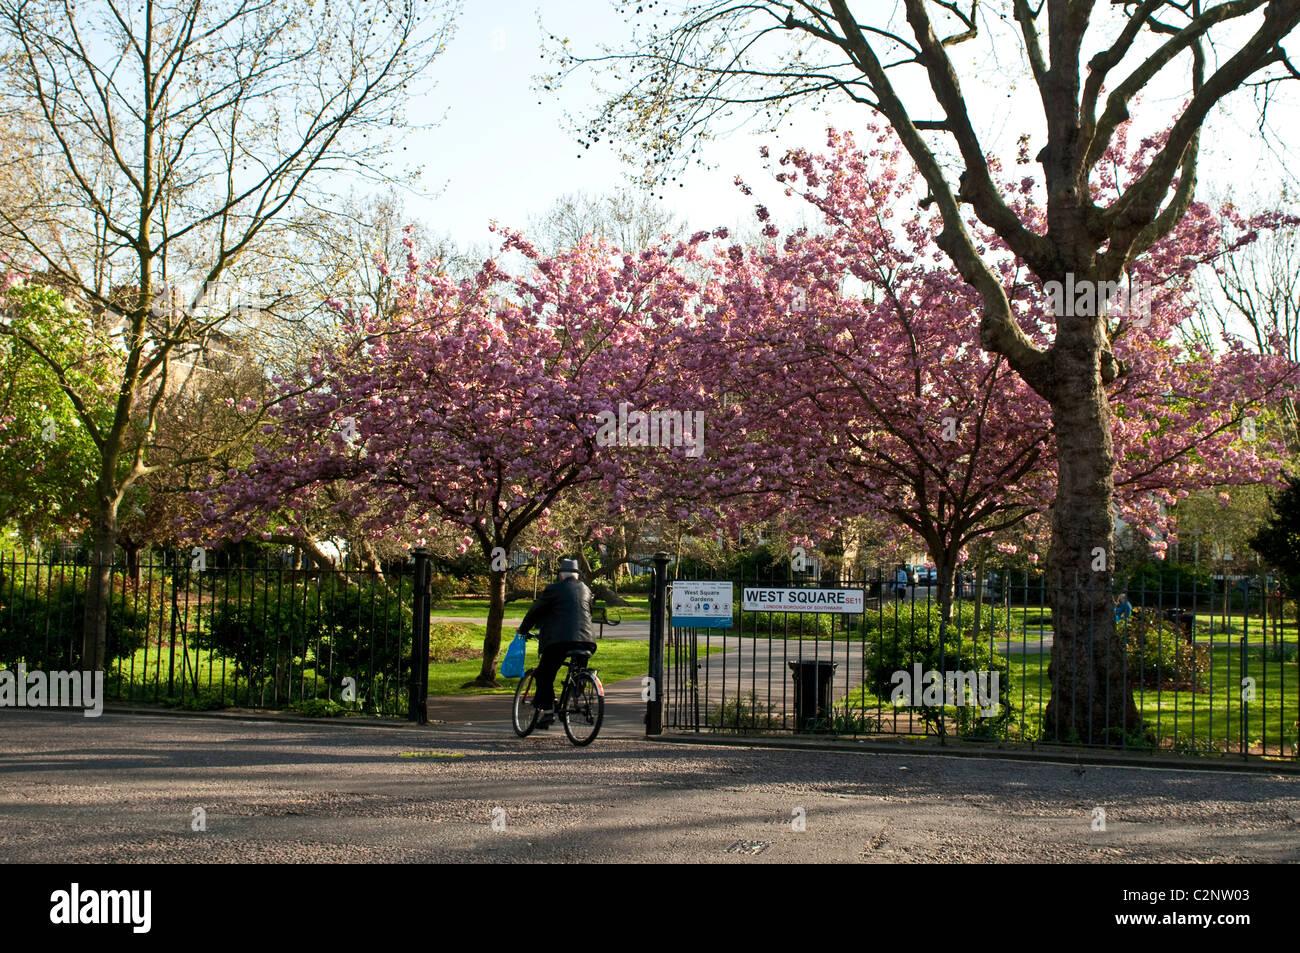 Communal gardens, West Square, SE11, Southwark, London, UK - Stock Image